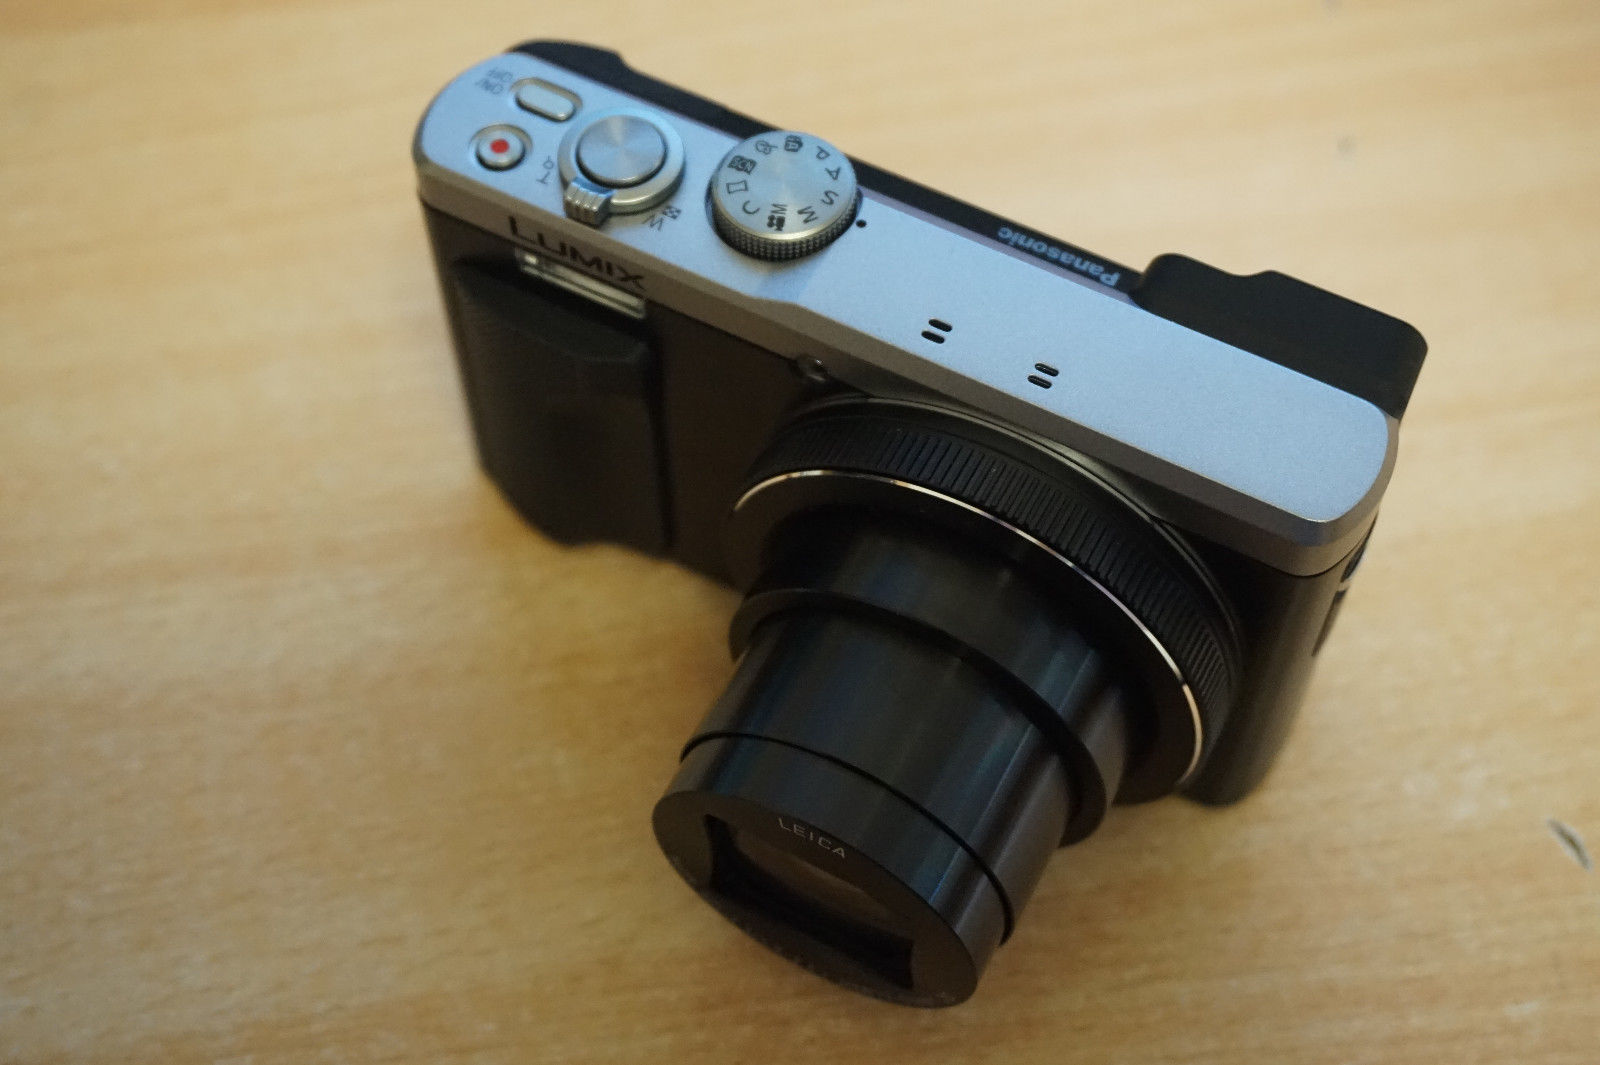 Panasonic Lumix DMC-TZ81 schwarz Kompaktkamera 30x Zoom Touchscreen 4k Wifi Vide